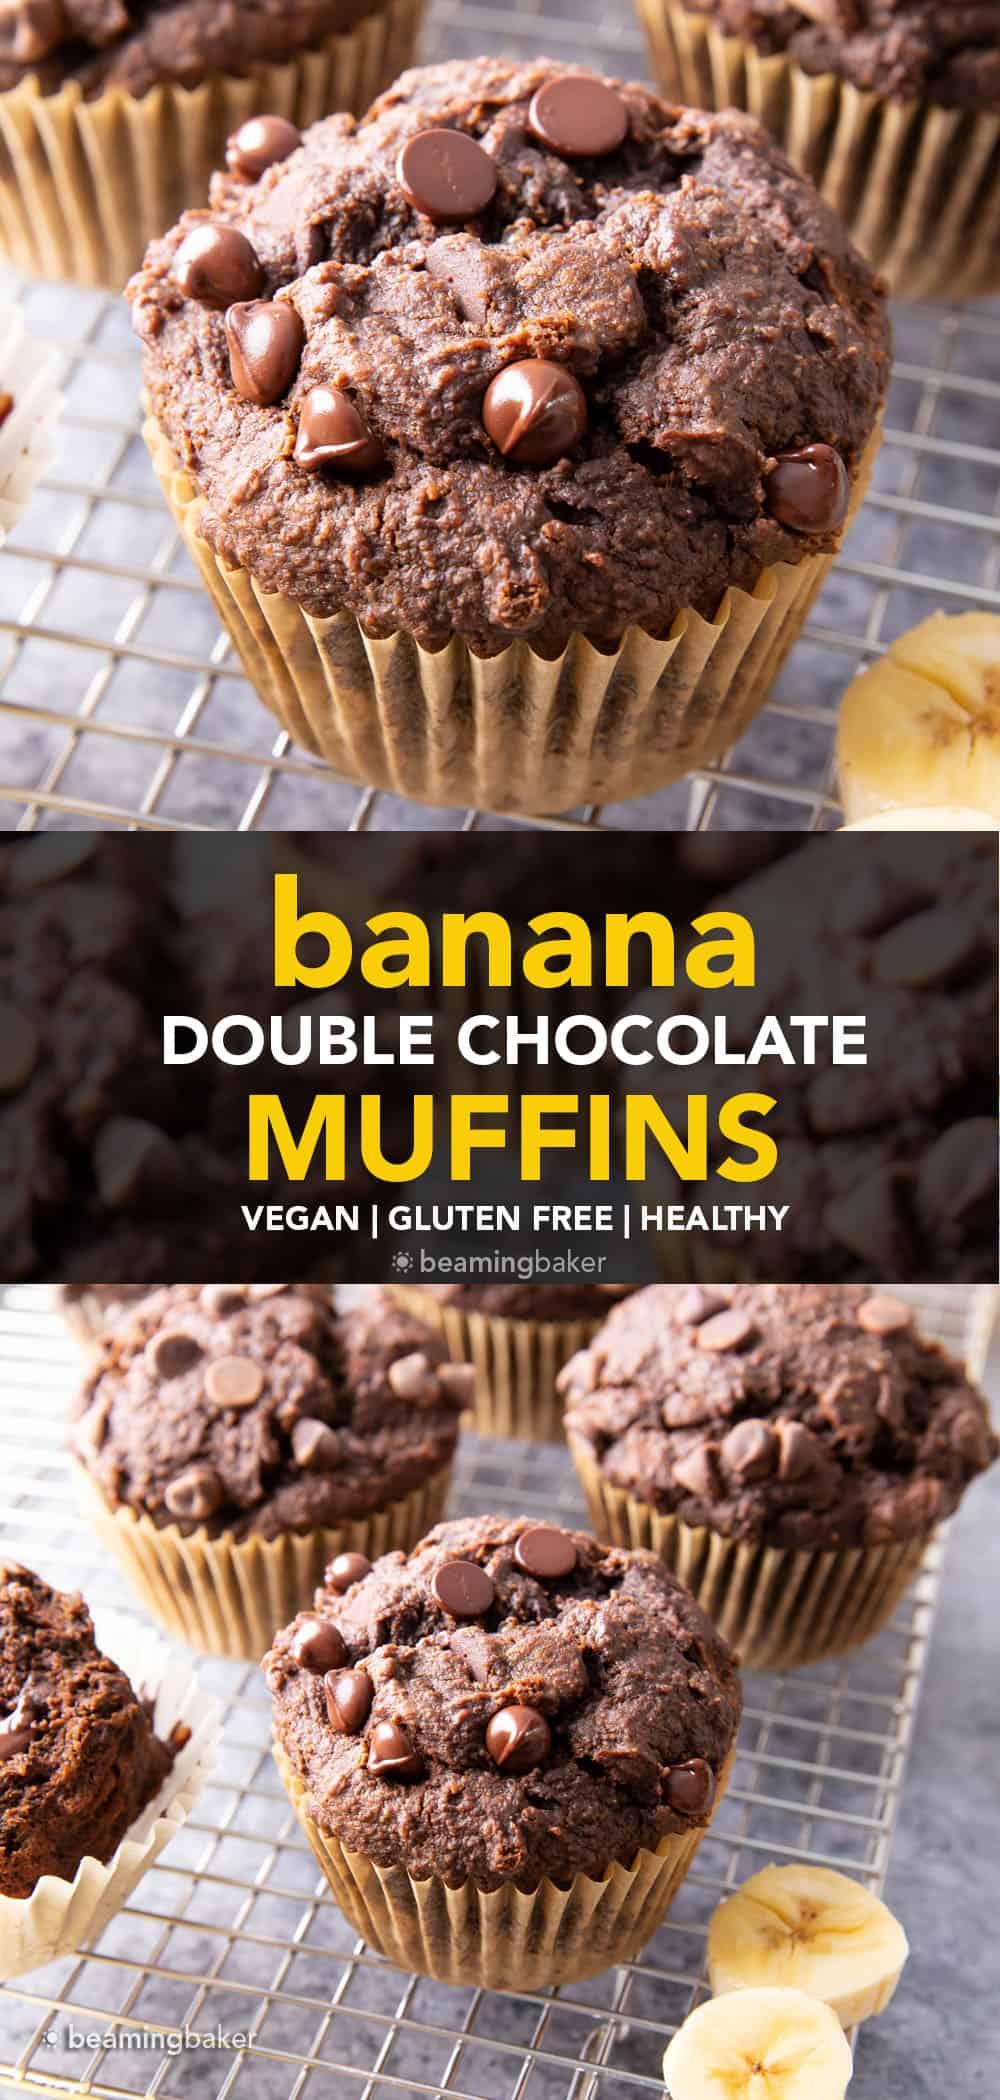 Healthy Banana Chocolate Chocolate Chip Muffins: tender & moist rich chocolate banana muffins. The best healthy chocolate banana muffins—fluffy & fudgy, deep chocolate brownie flavor. SO GOOD! #Healthy #Chocolate #Banana #Muffins   Recipe at BeamingBaker.com